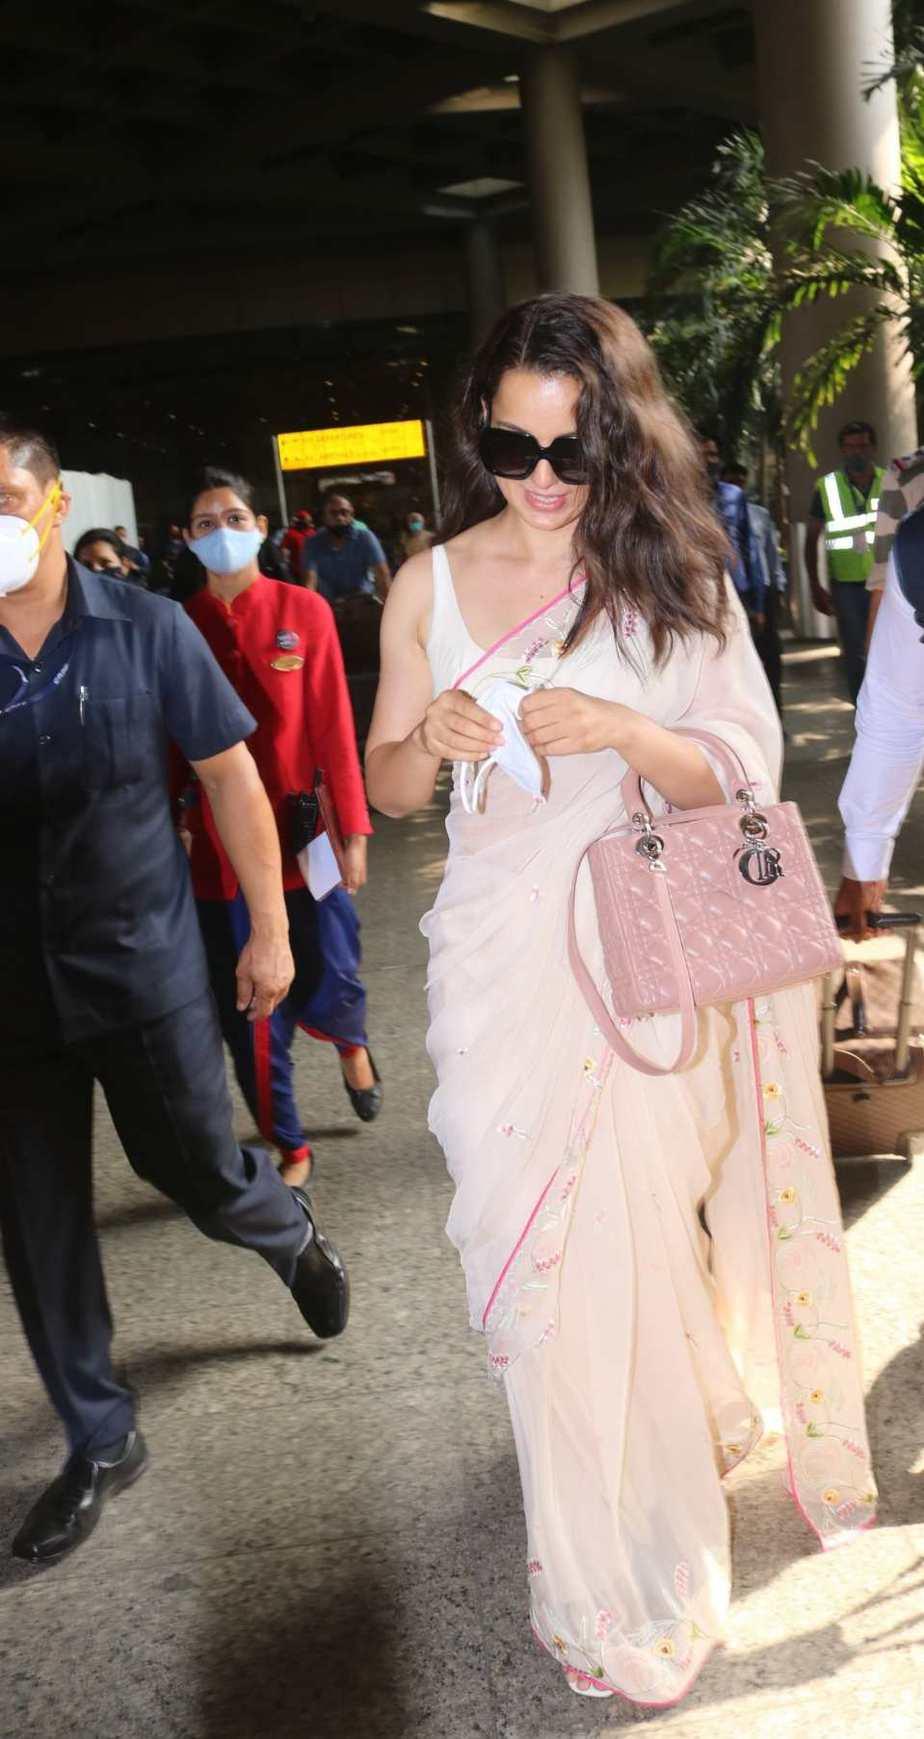 Kangana Ranaut spotted at airport arrival in pink saree-3 (1)